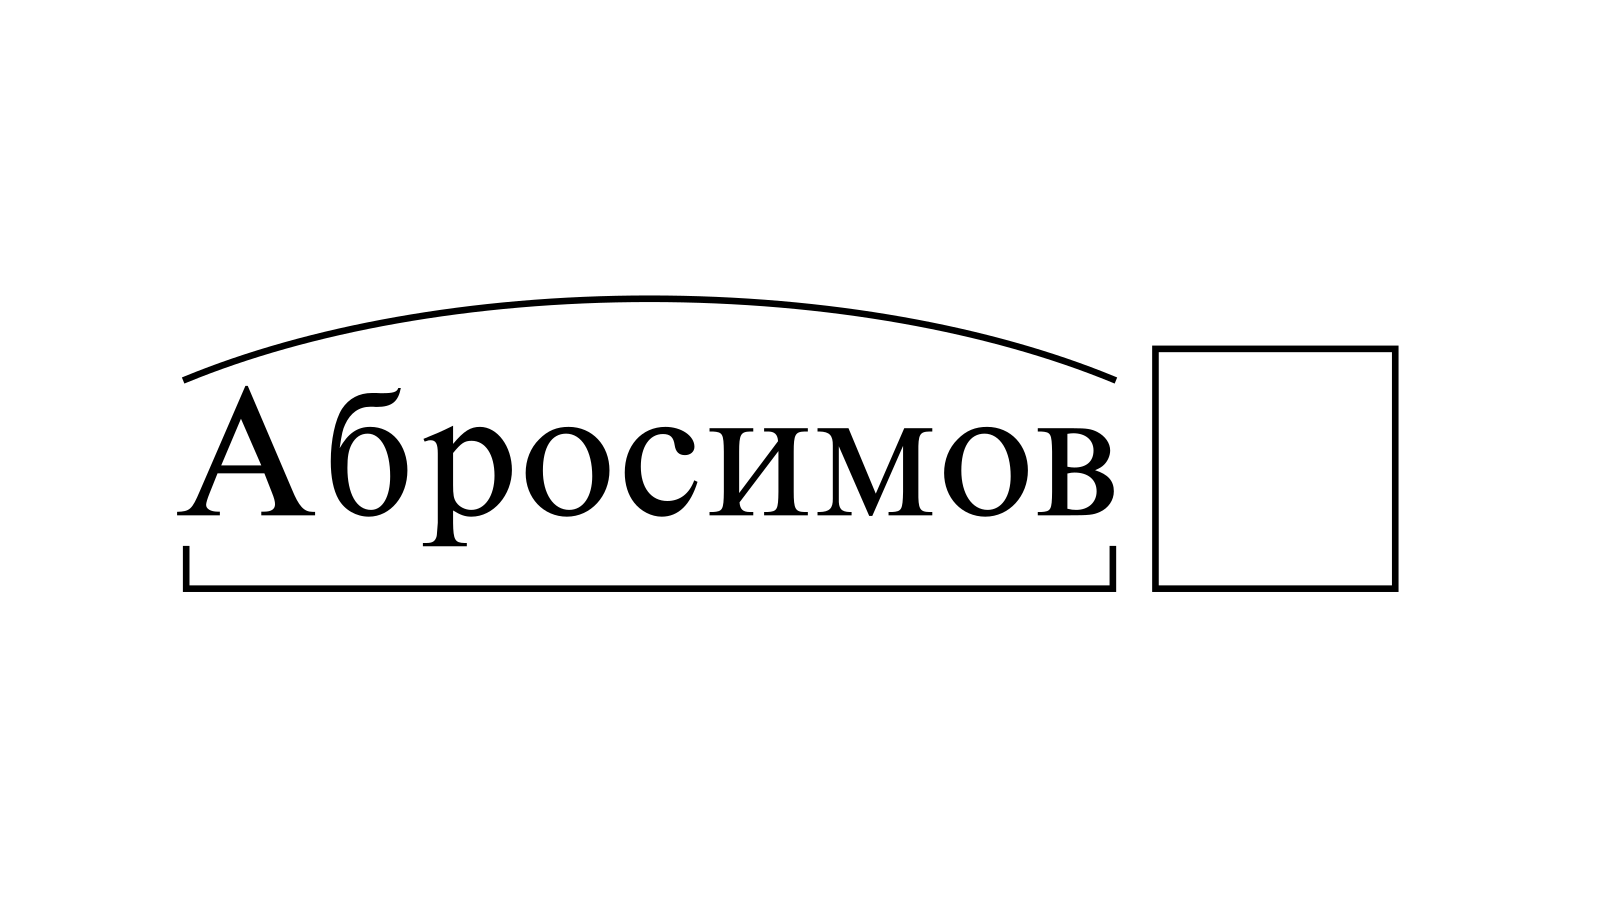 Разбор слова «Абросимов» по составу